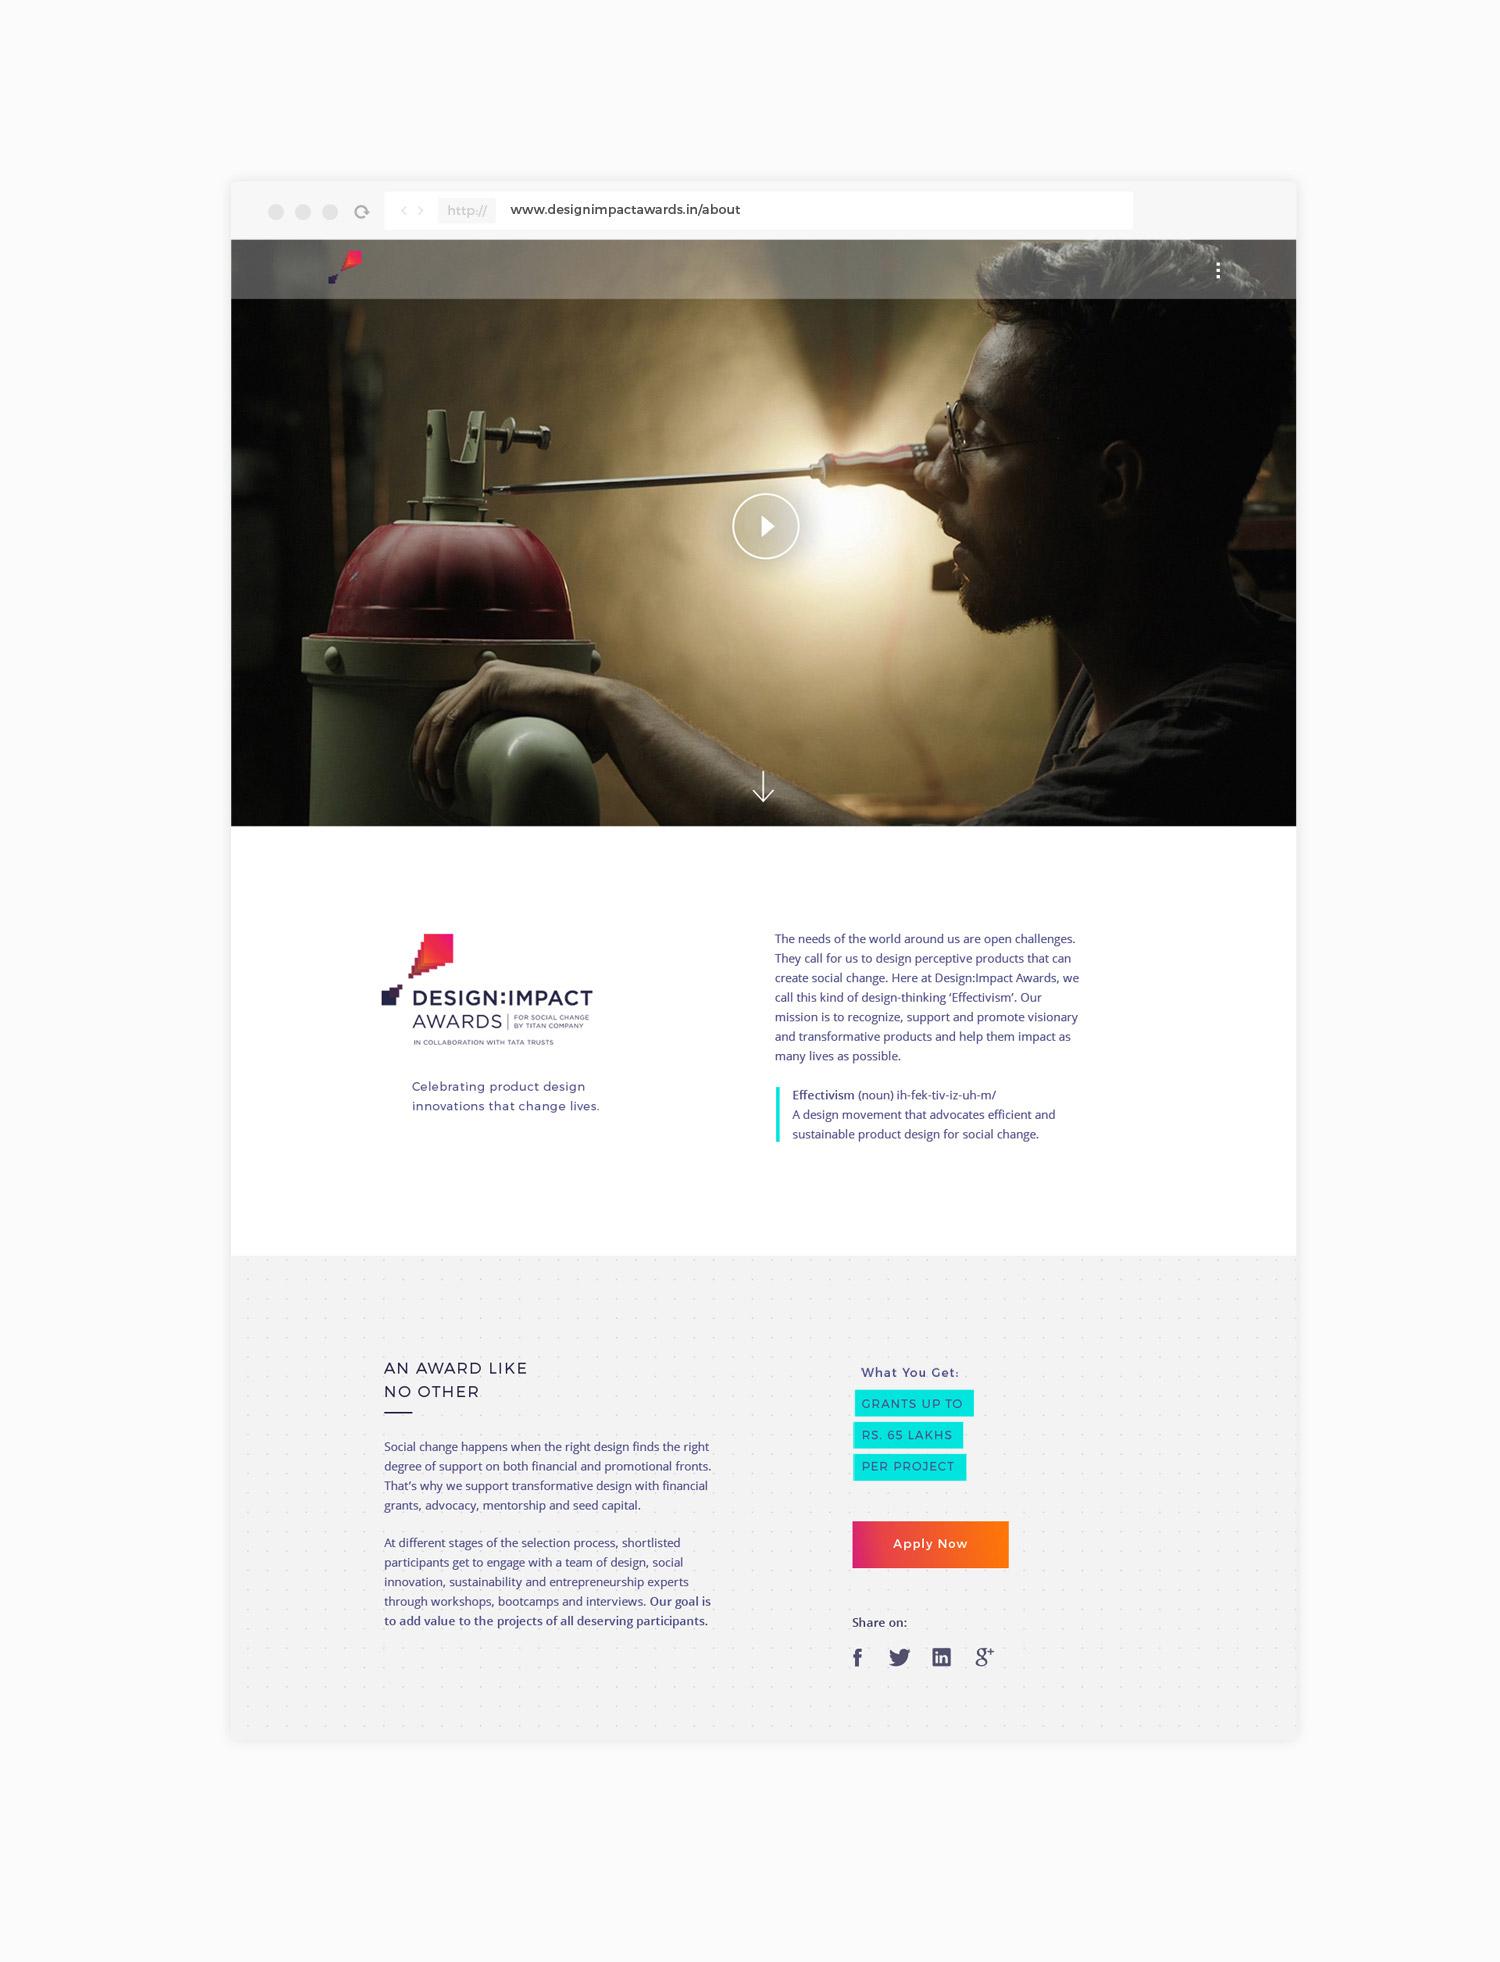 DIA Homepage